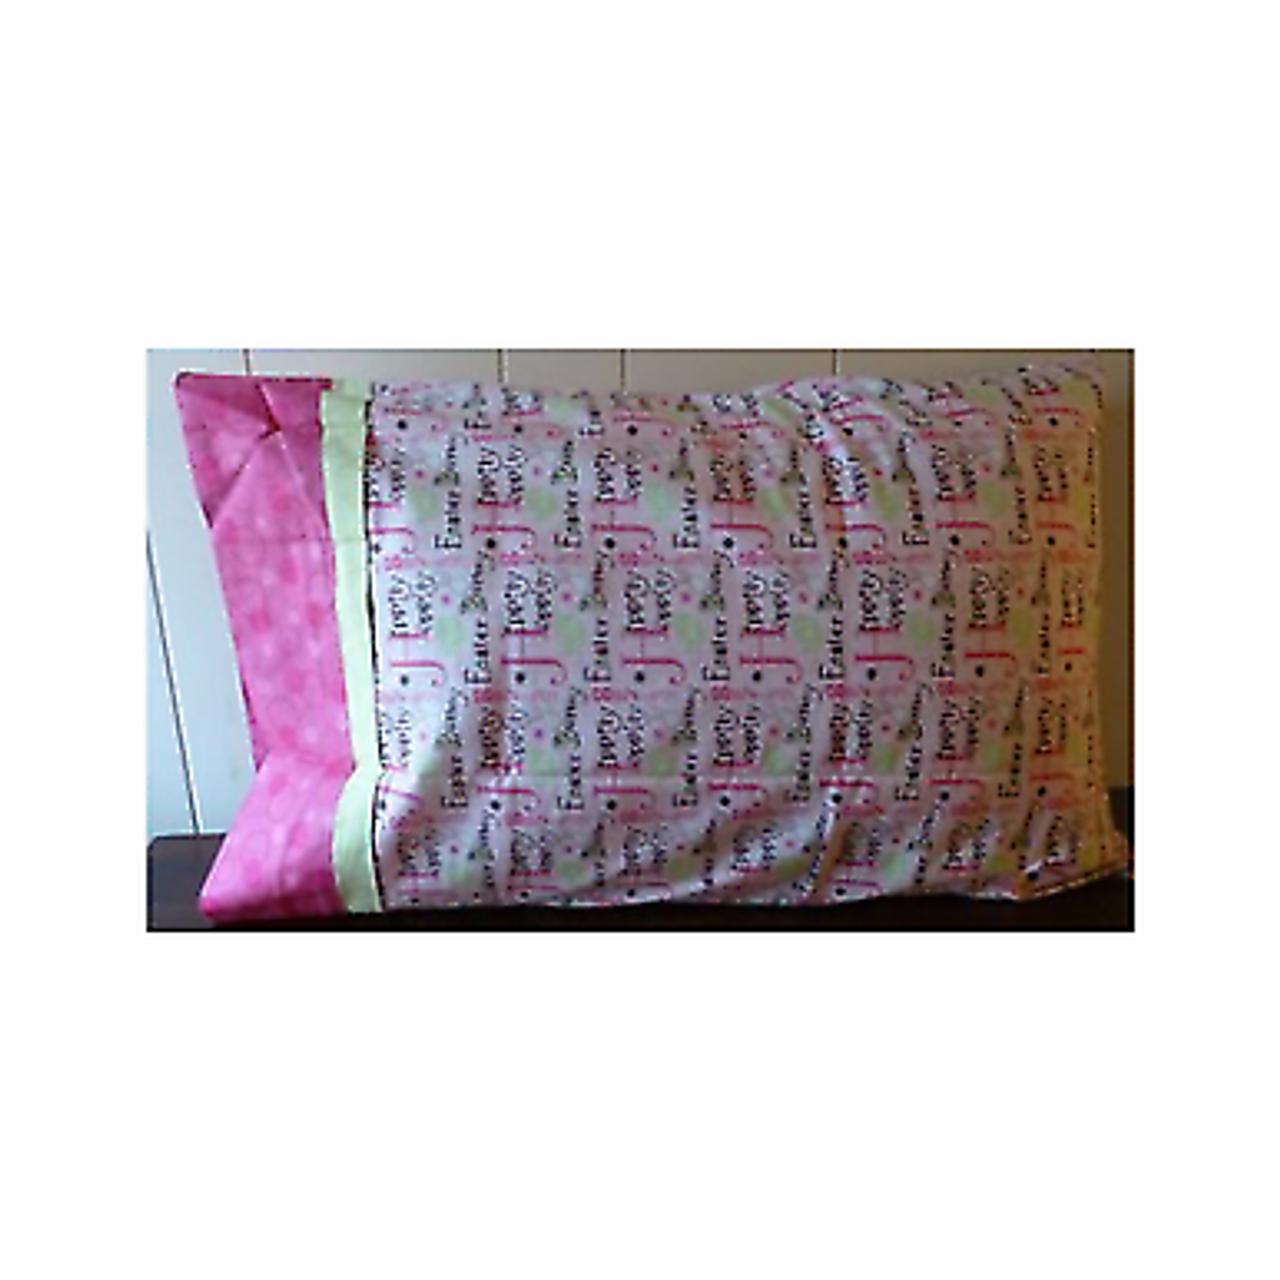 Travel Pillow Case  Child Pillow Case  Meet the Flintstones  Square Pillow Cover  Standard or Queen Pillow Case